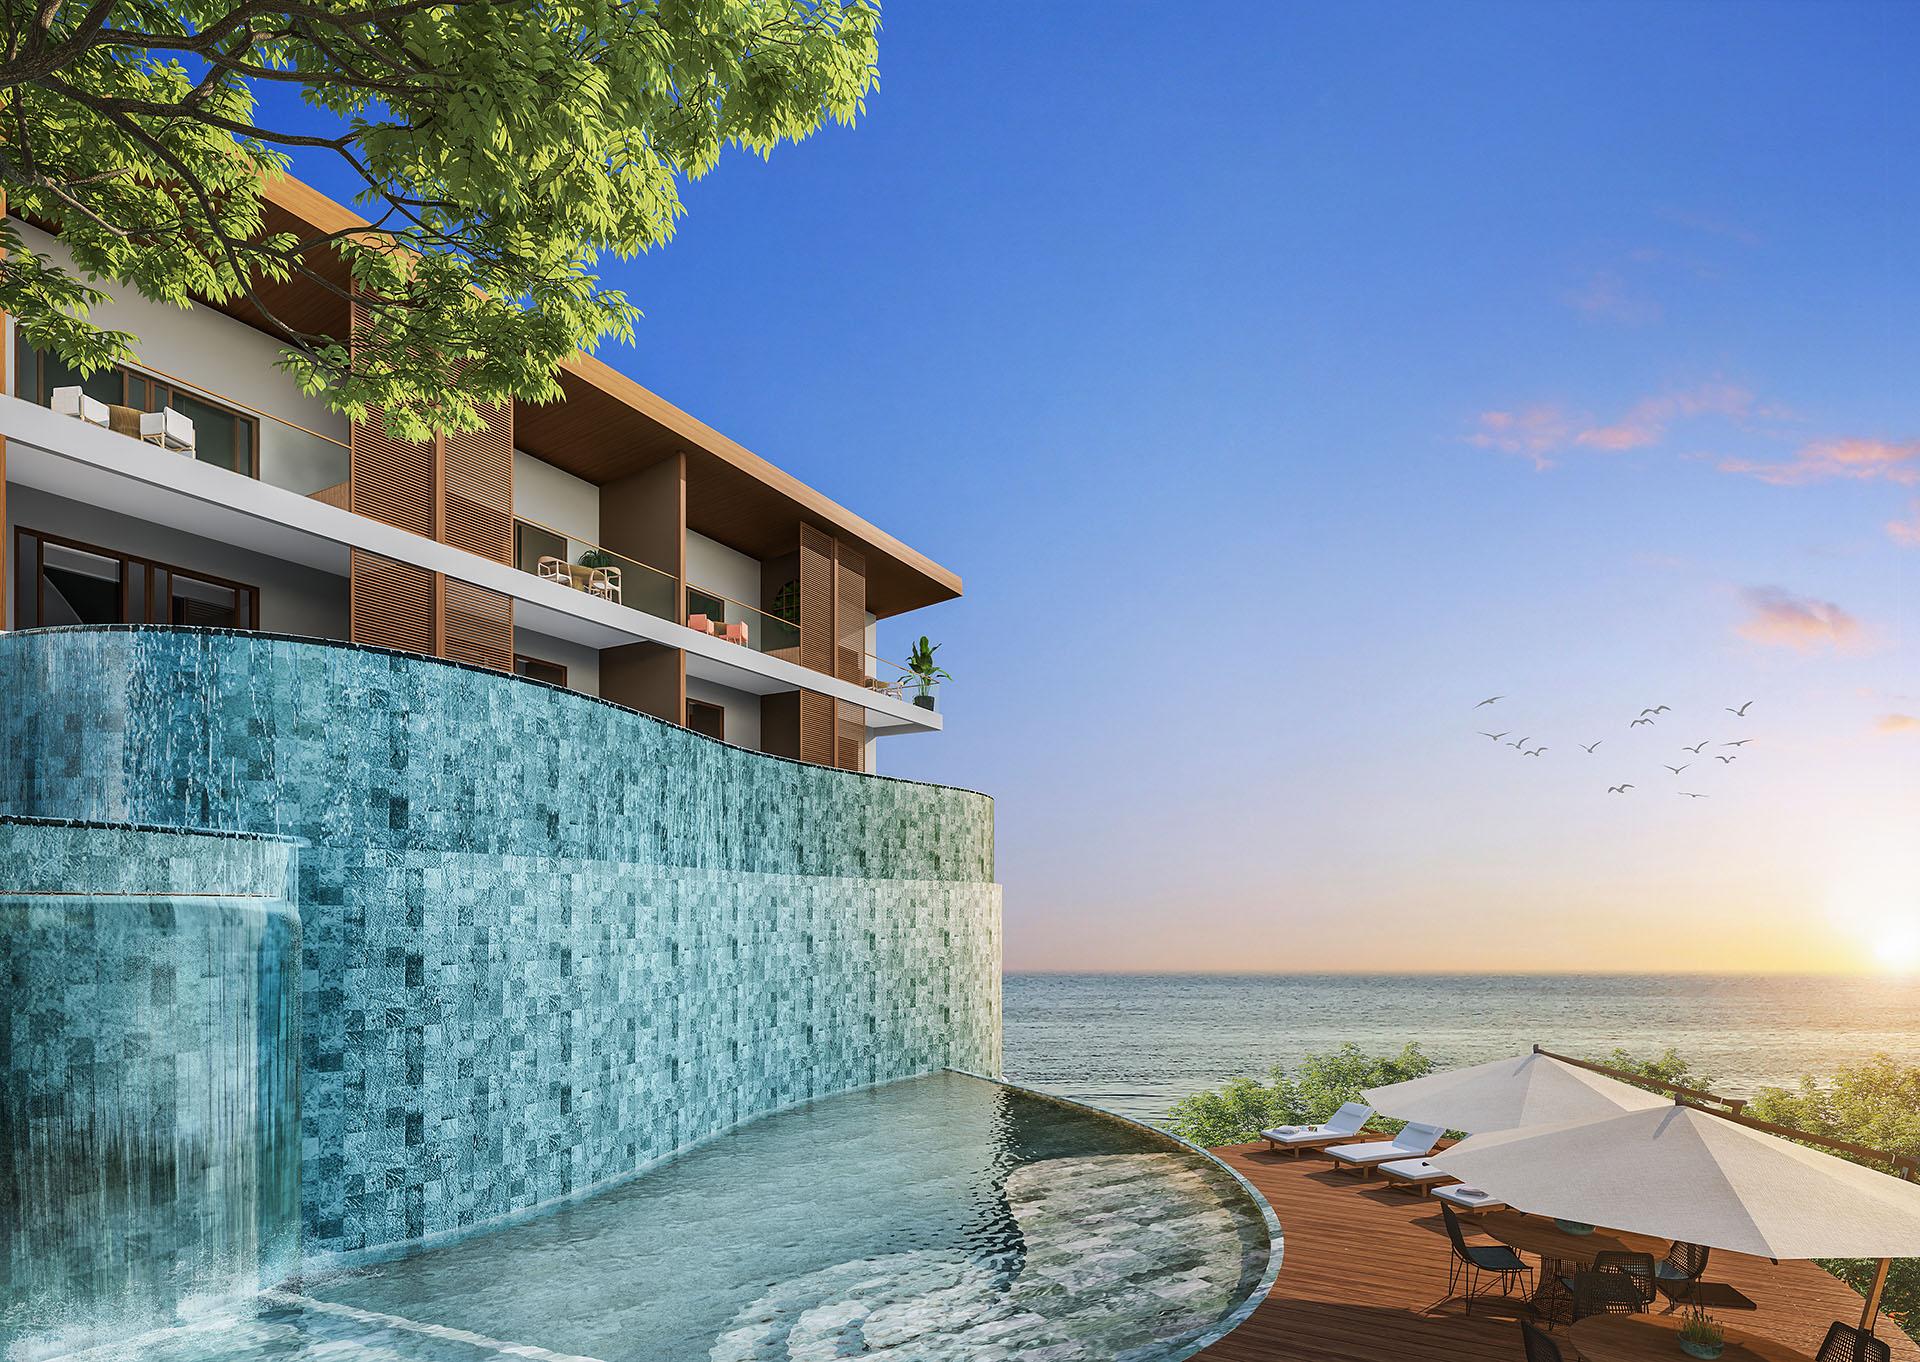 Perspectiva lateral da piscina com cascata e deck do Amerigo Vespucci